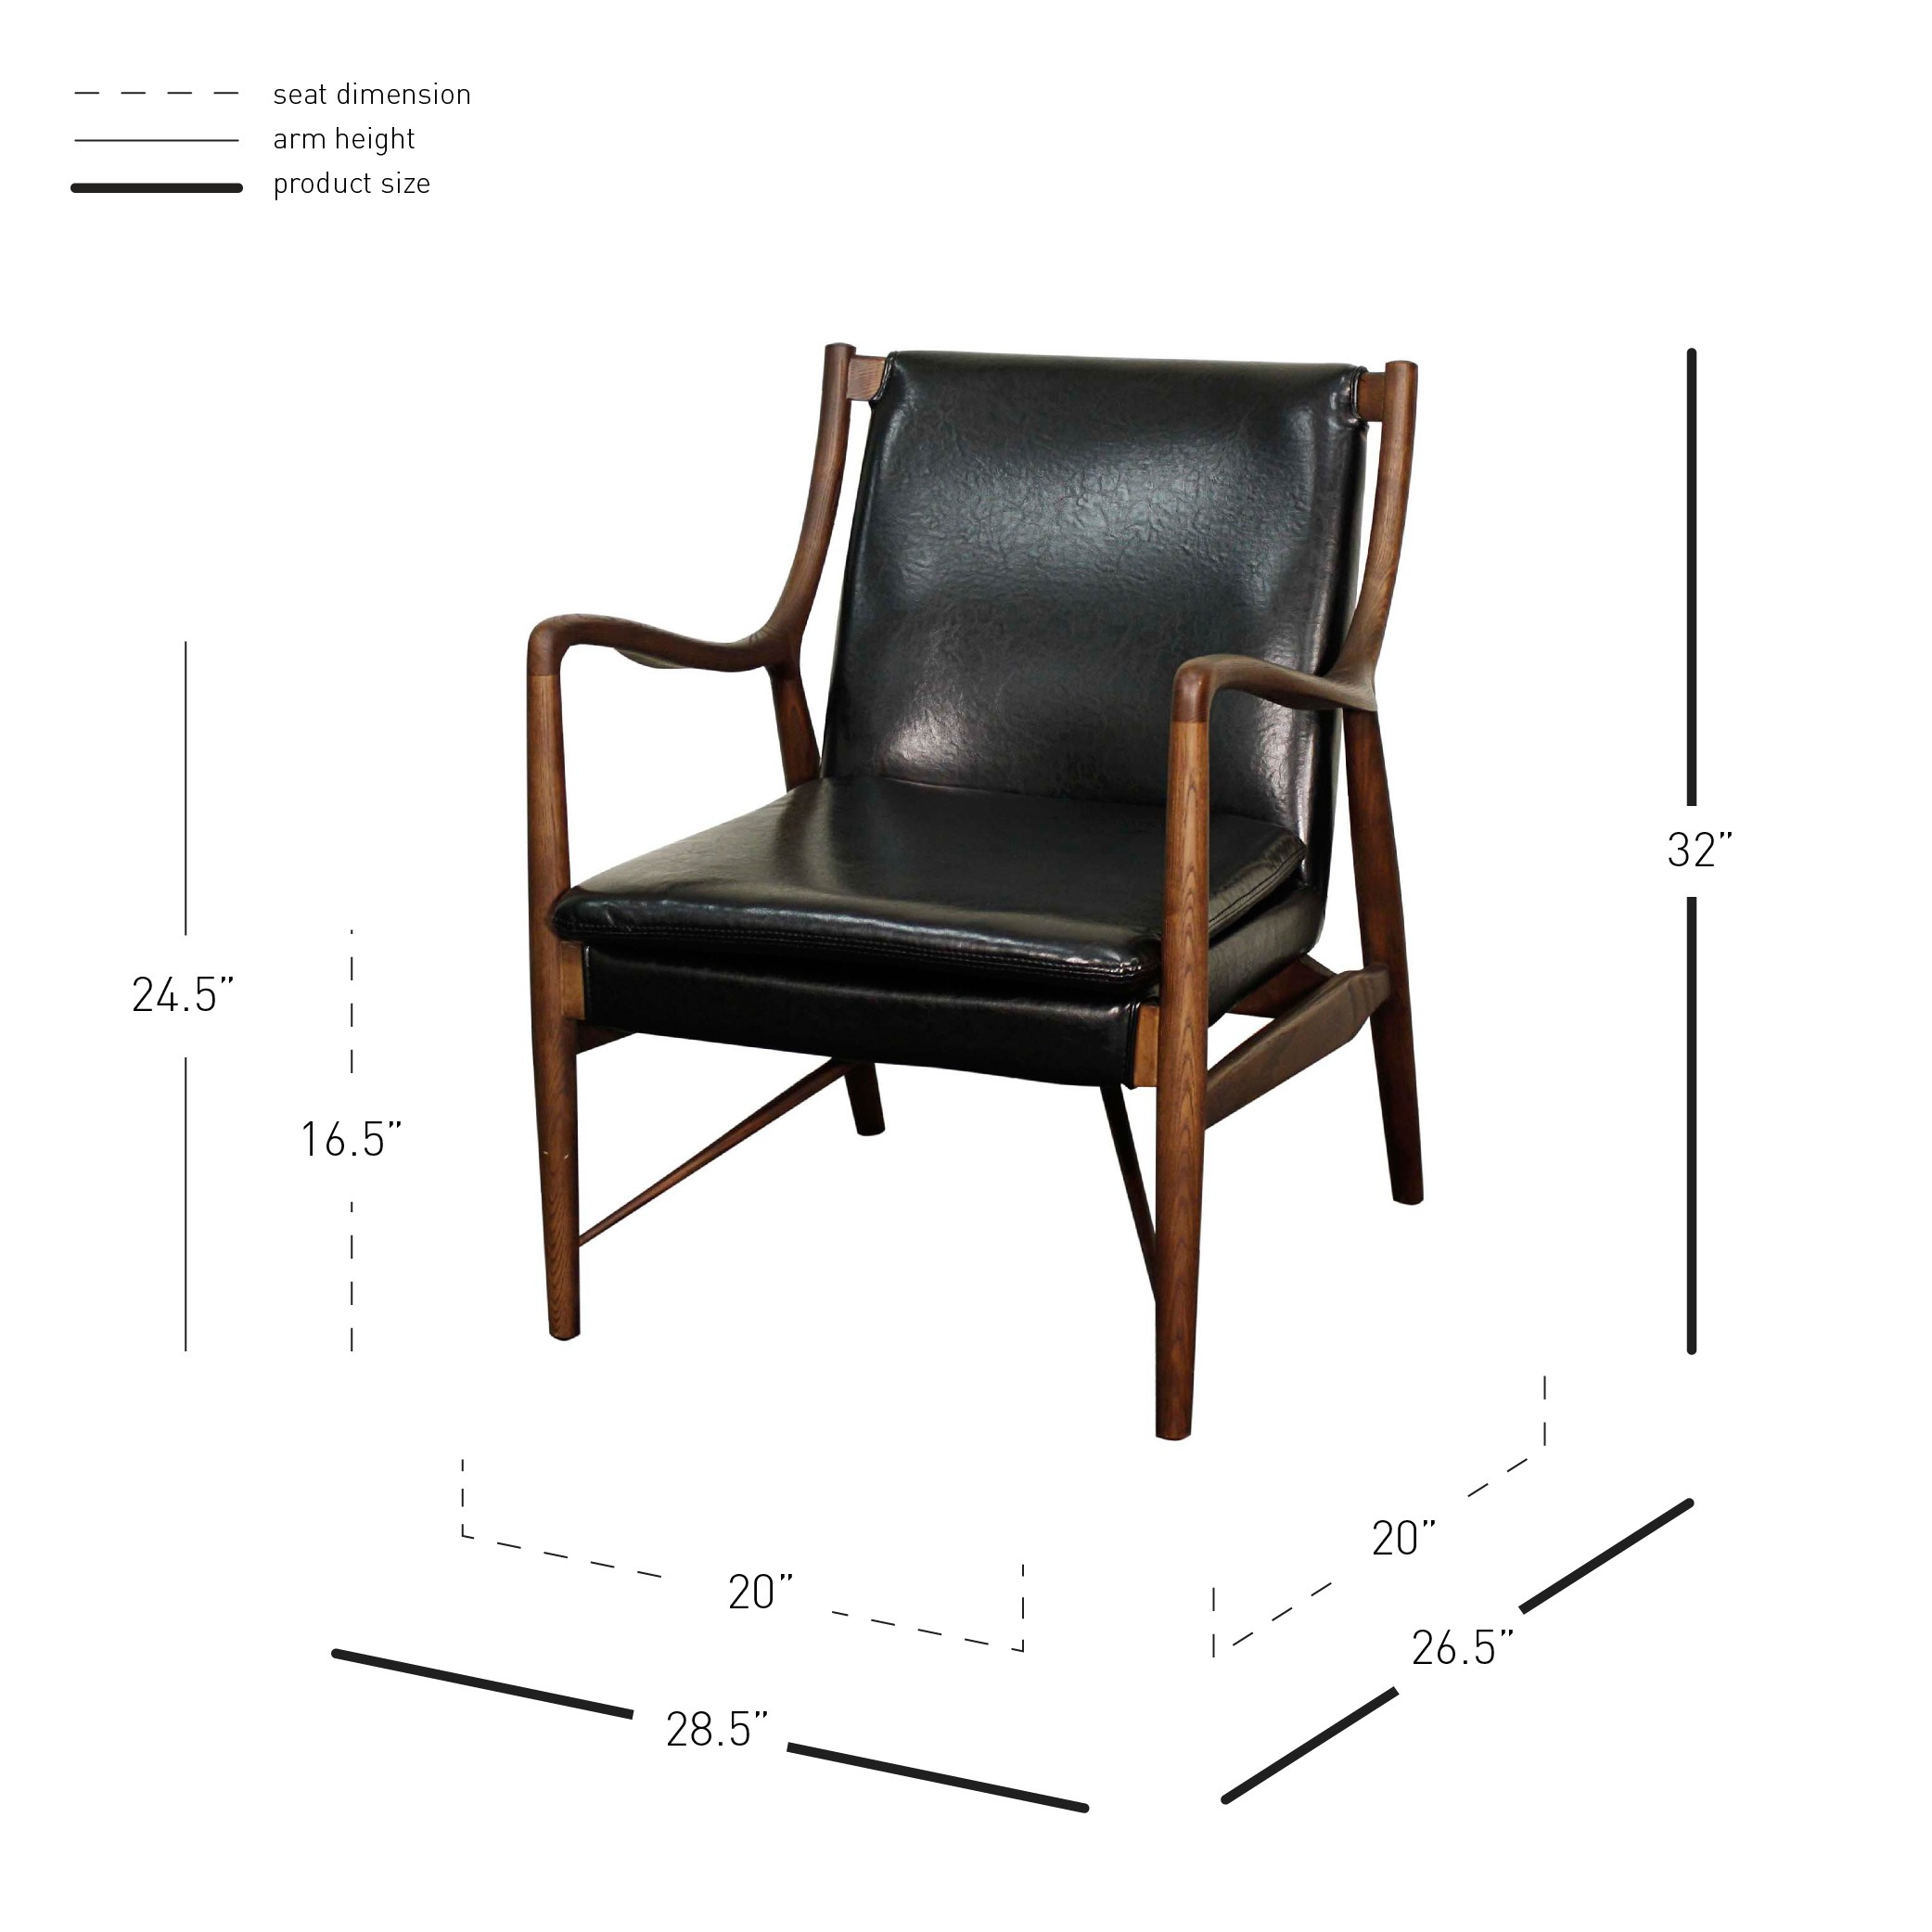 413032b 23 Dt Npd Furniture Stylish Amp Affordable